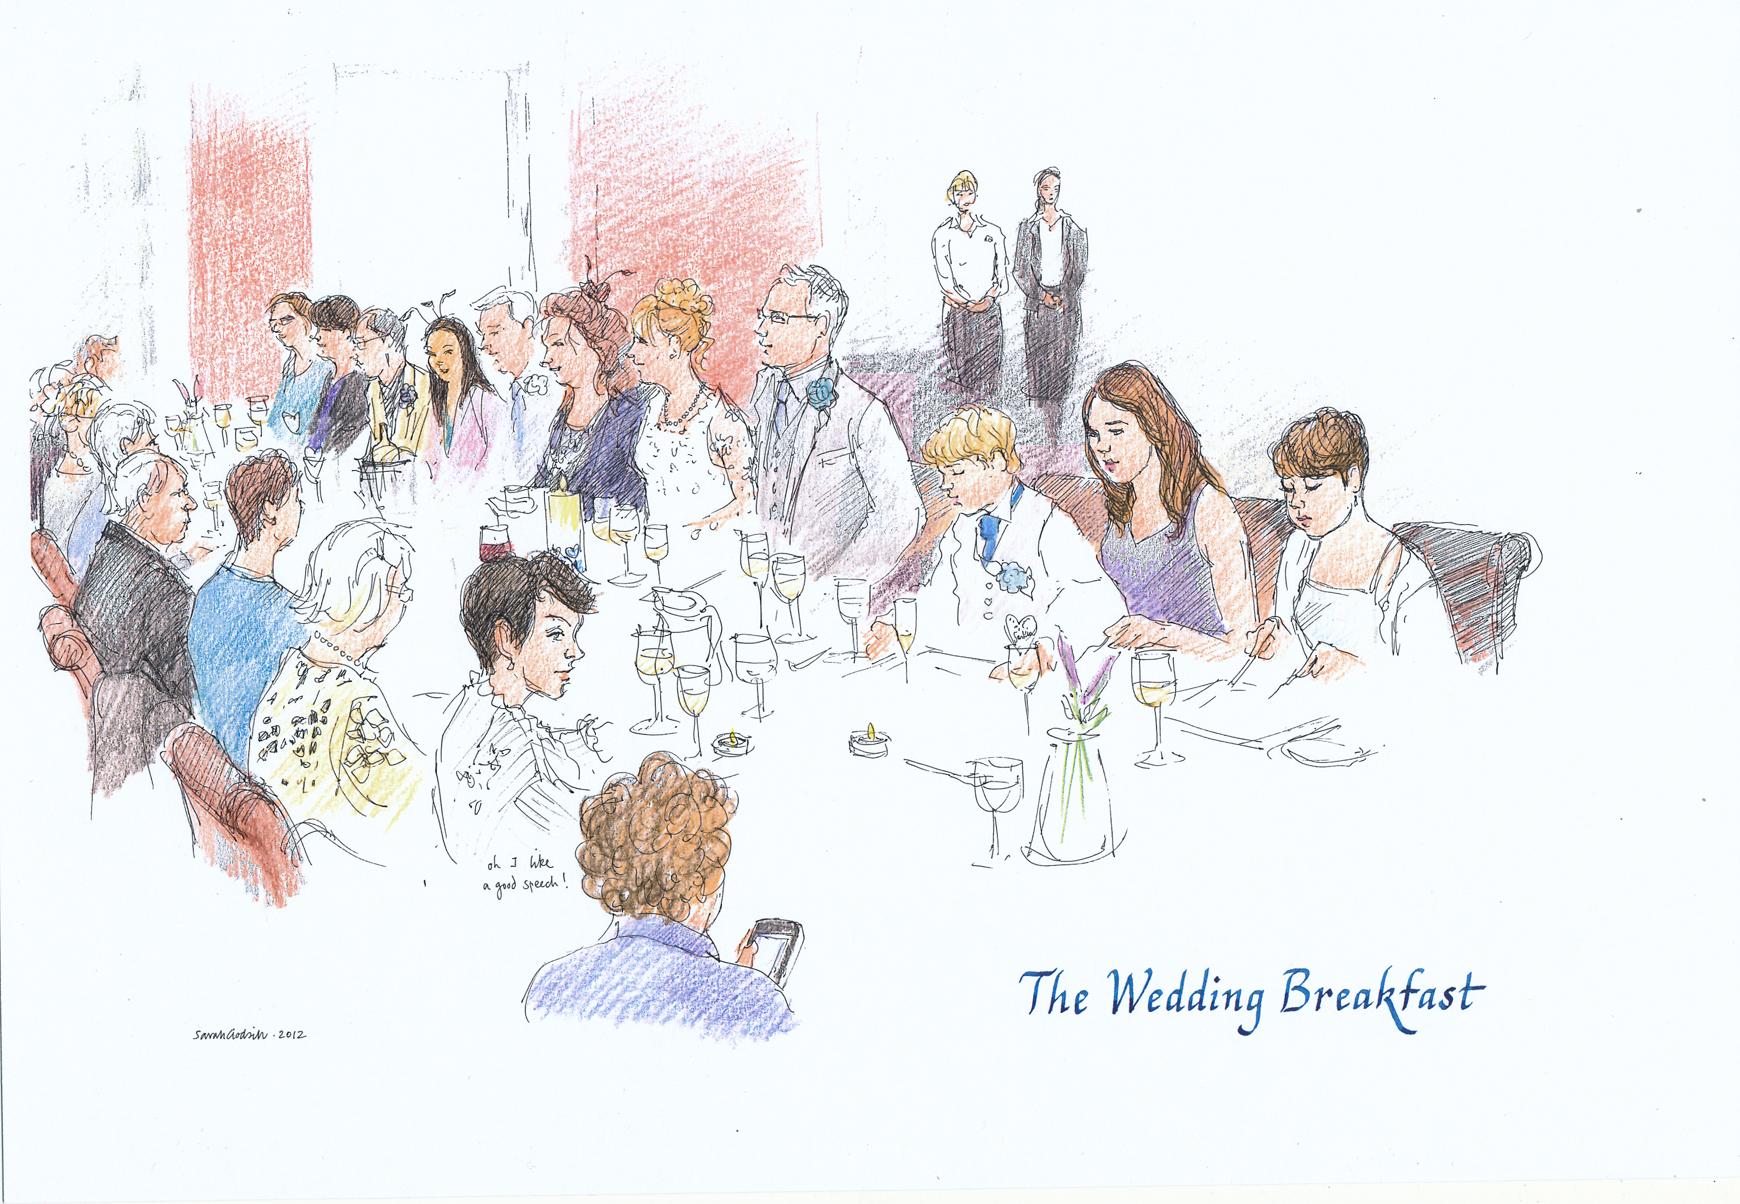 fiona-and-nick-wedding-breakfast